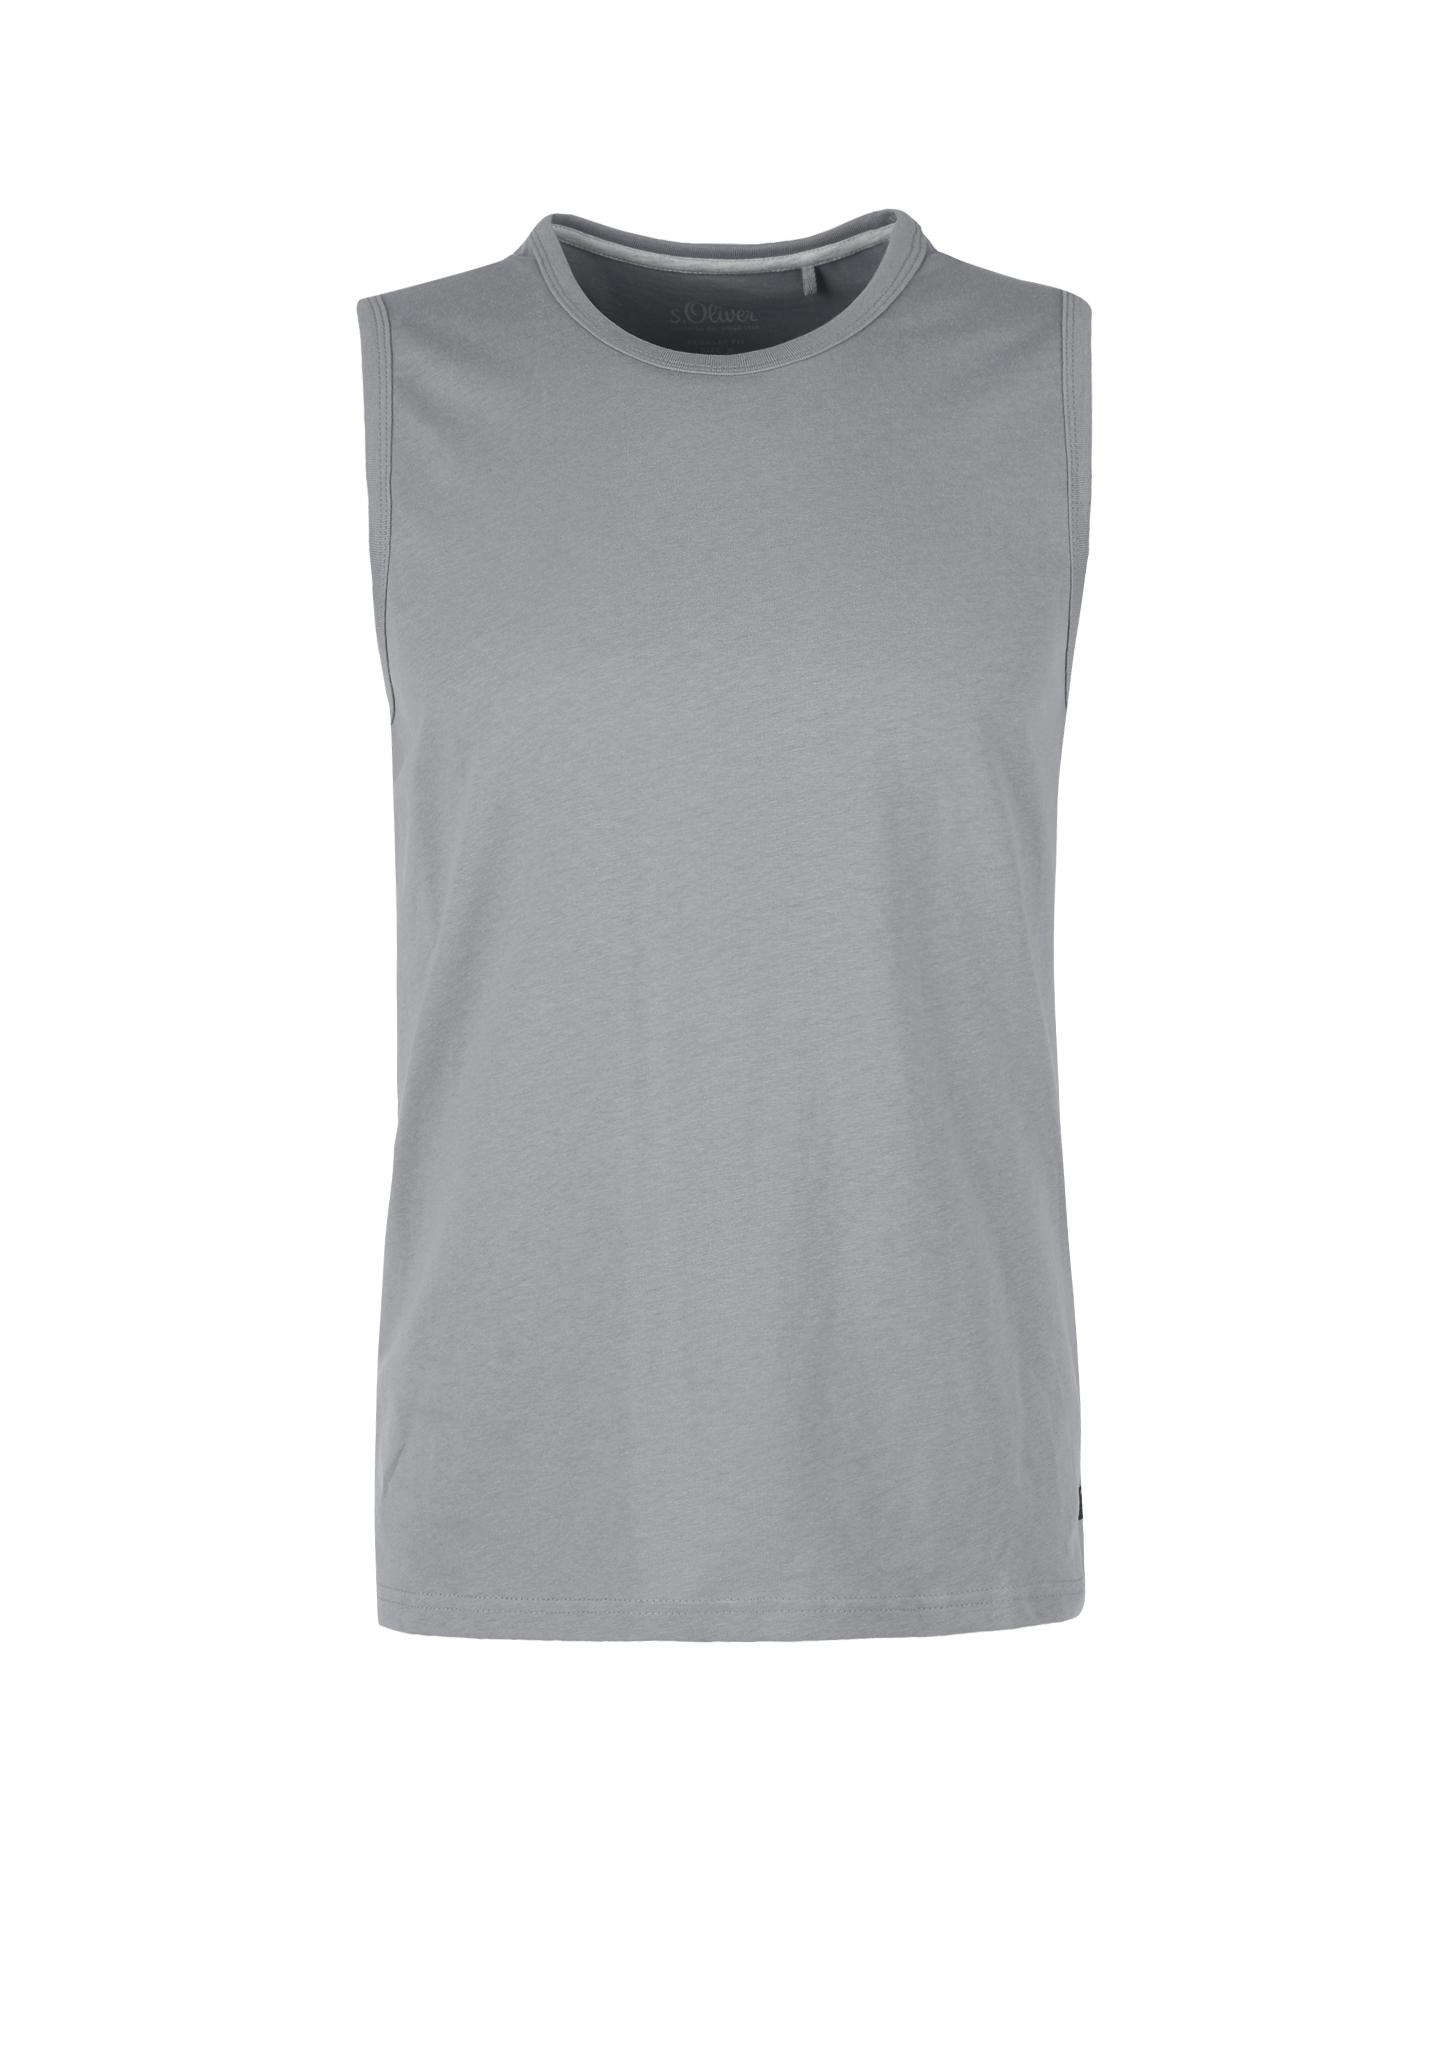 Tanktop | Sportbekleidung > Tanktops | s.Oliver